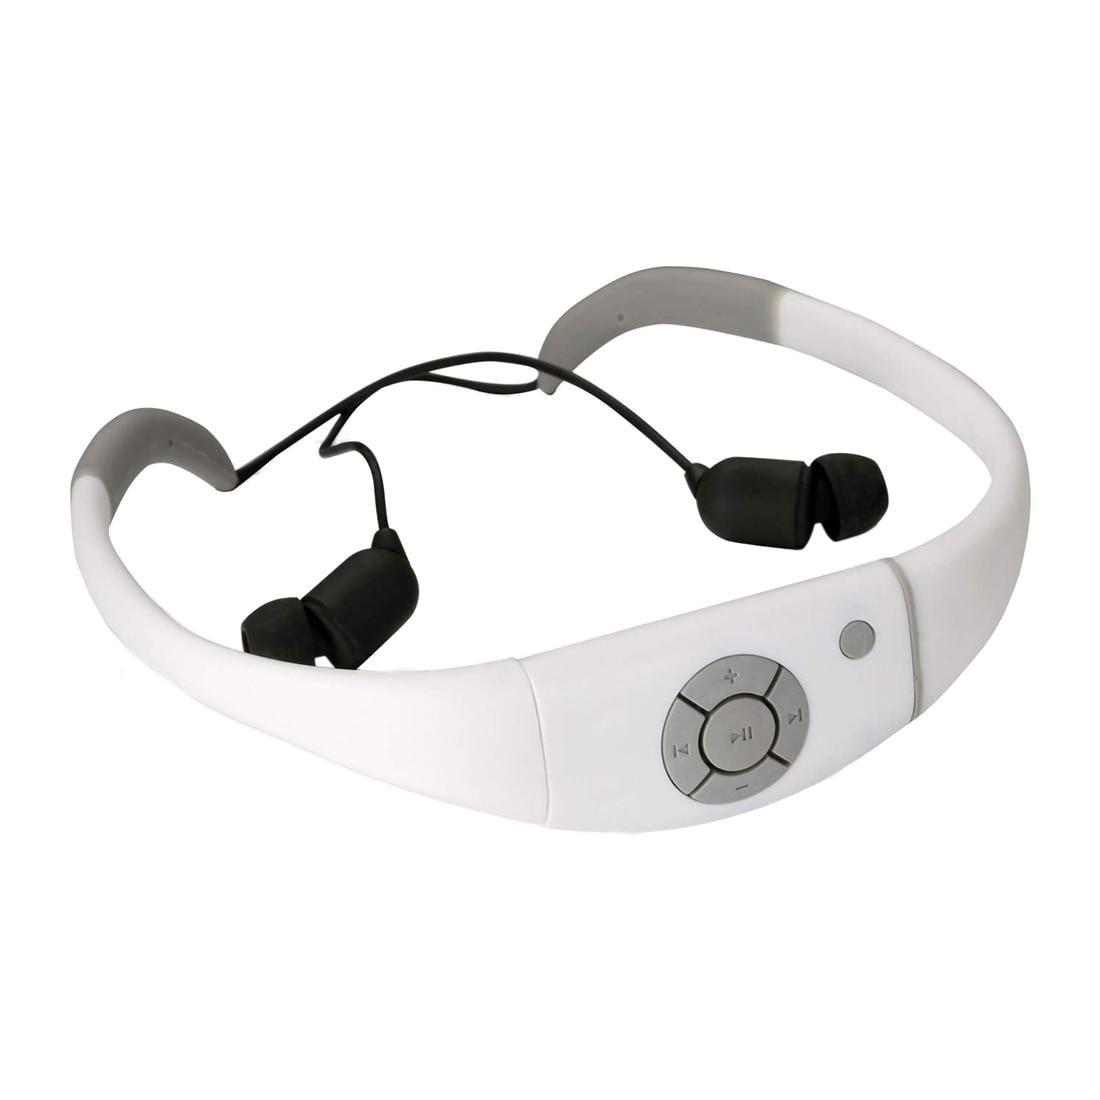 Waterproof Mp3 Headset Music Player 8gb Memory Hi fi Stero Earphone with Fm Radio